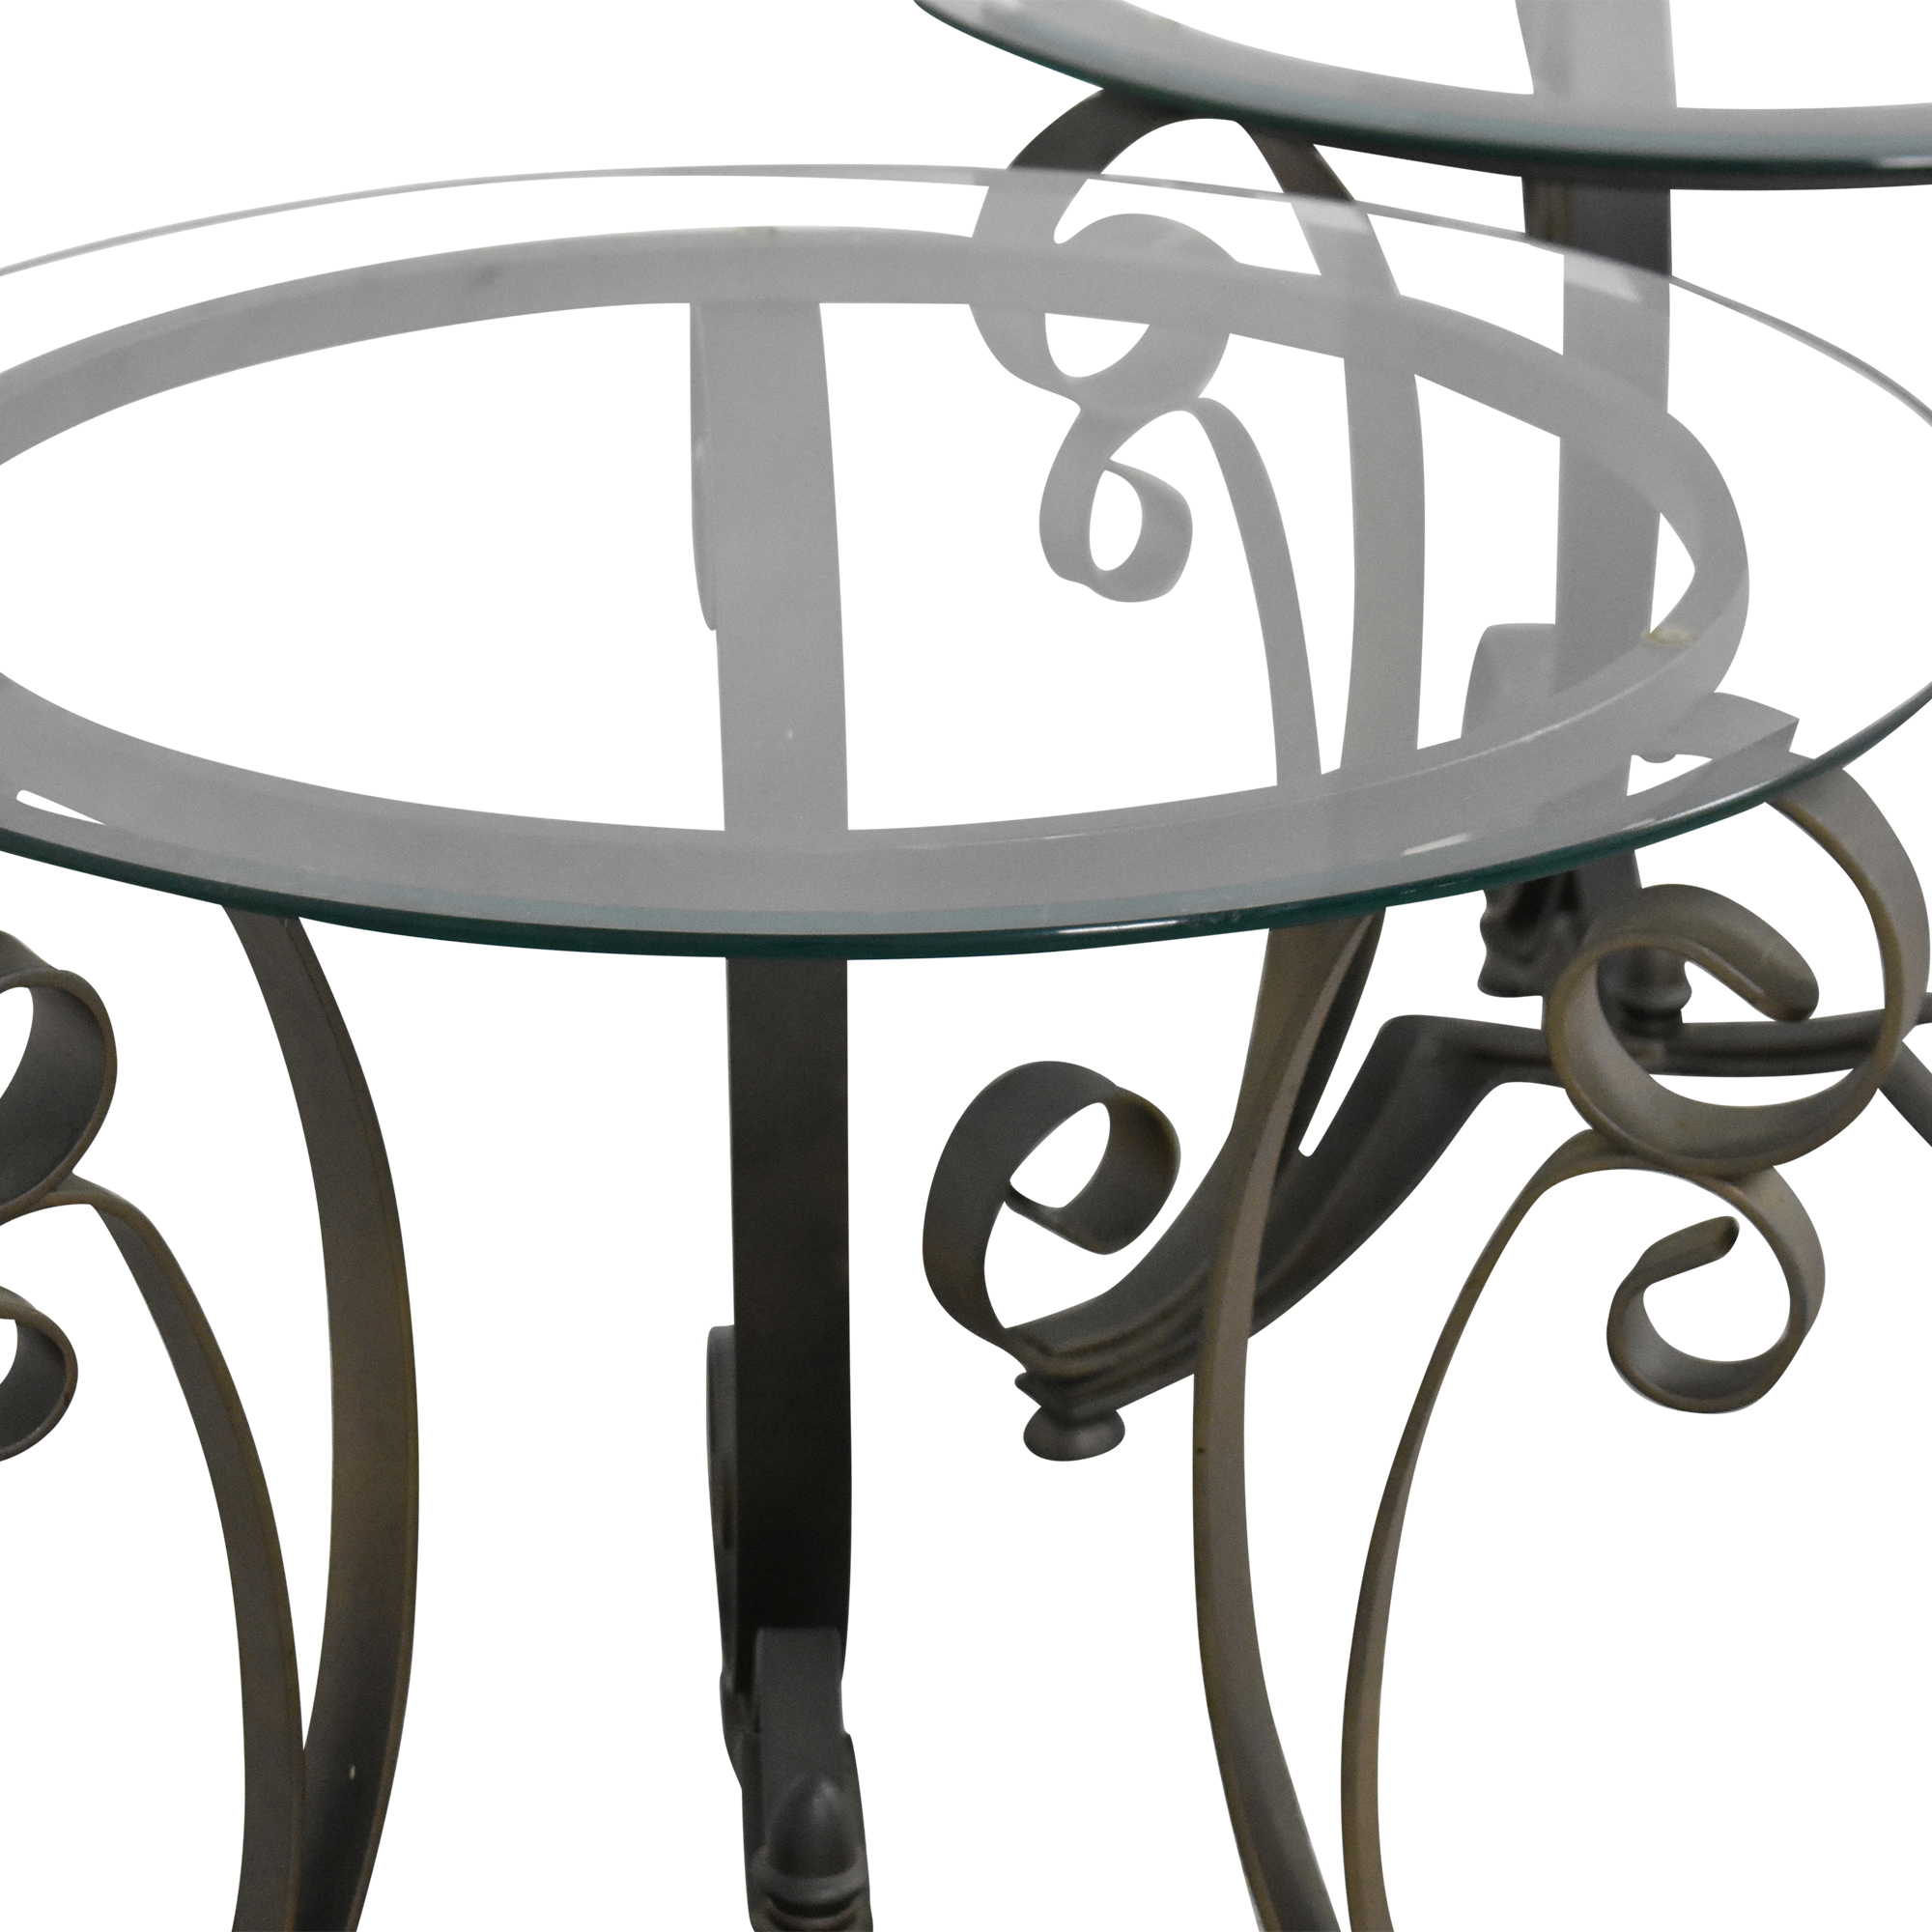 shop Bloomingdale's Art Deco End Tables Bloomingdale's End Tables